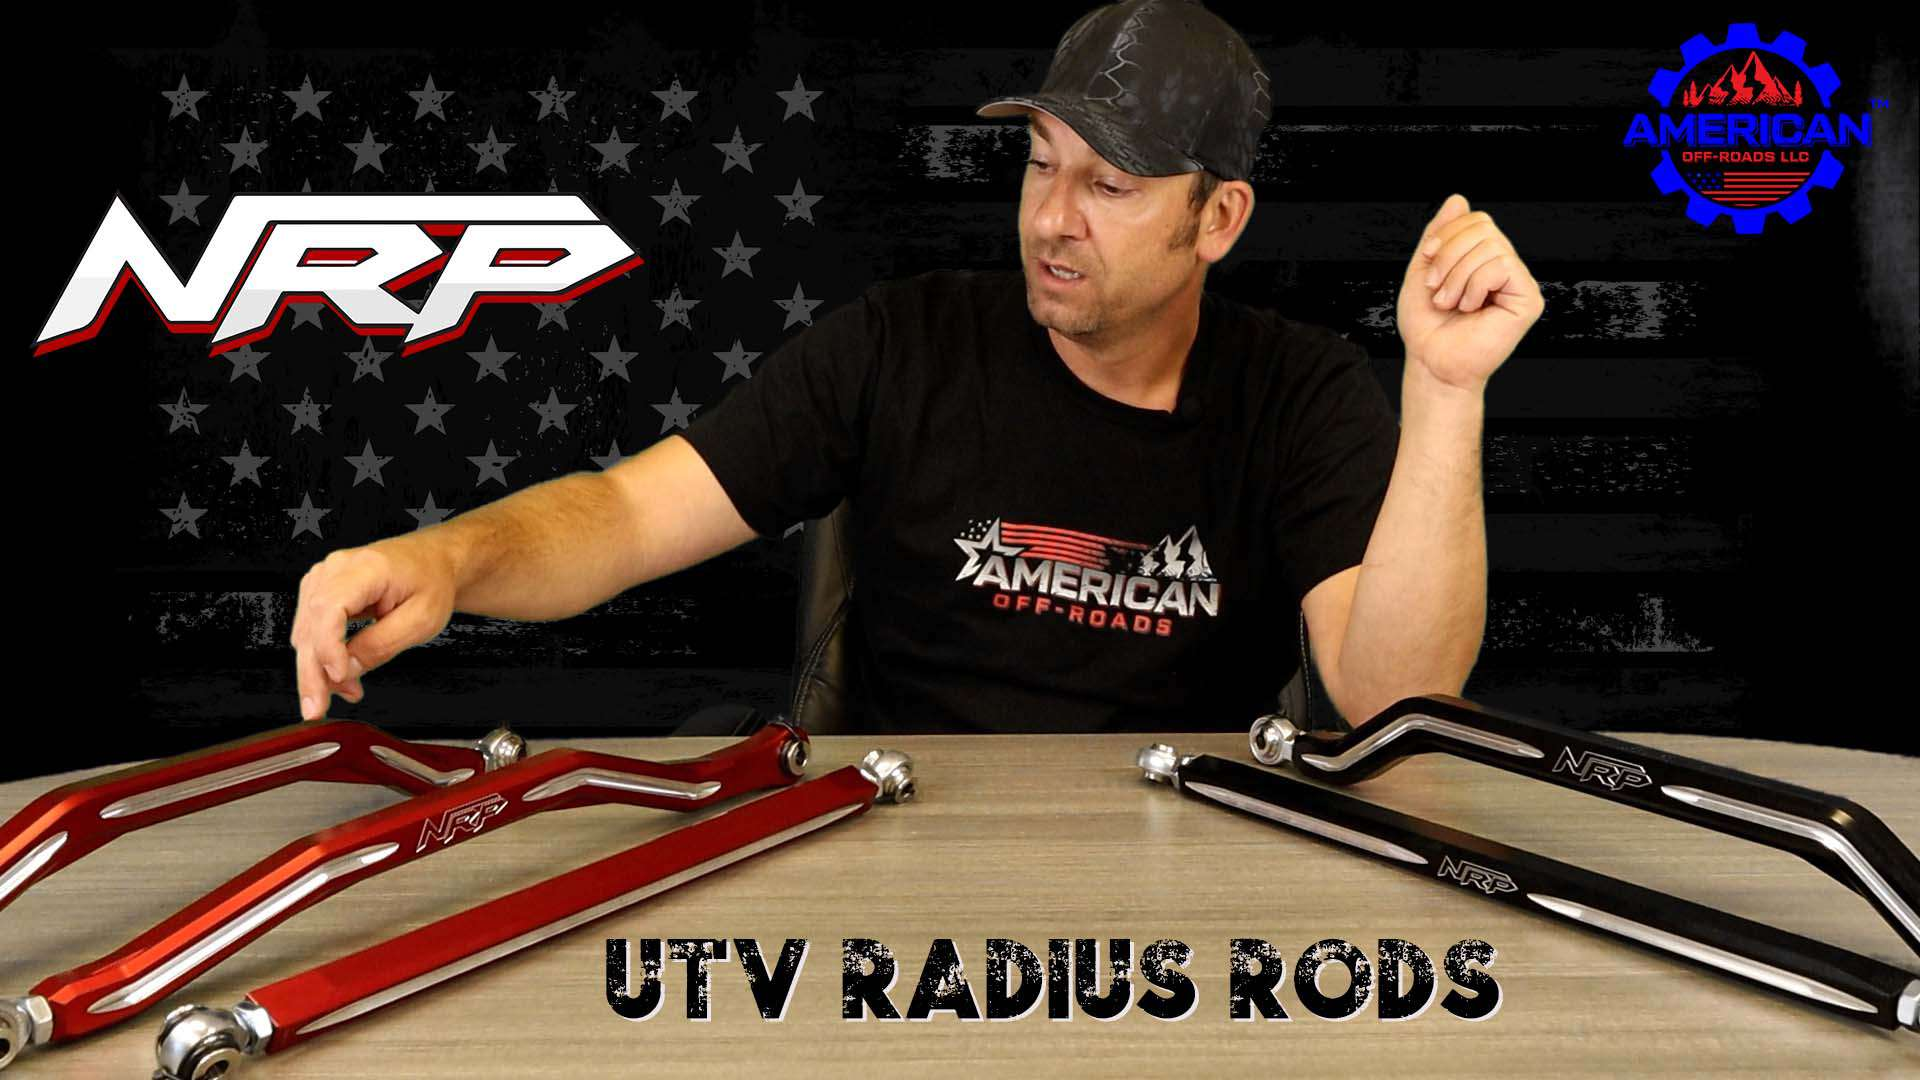 American Off-Roads Talk NRP Radius Rods